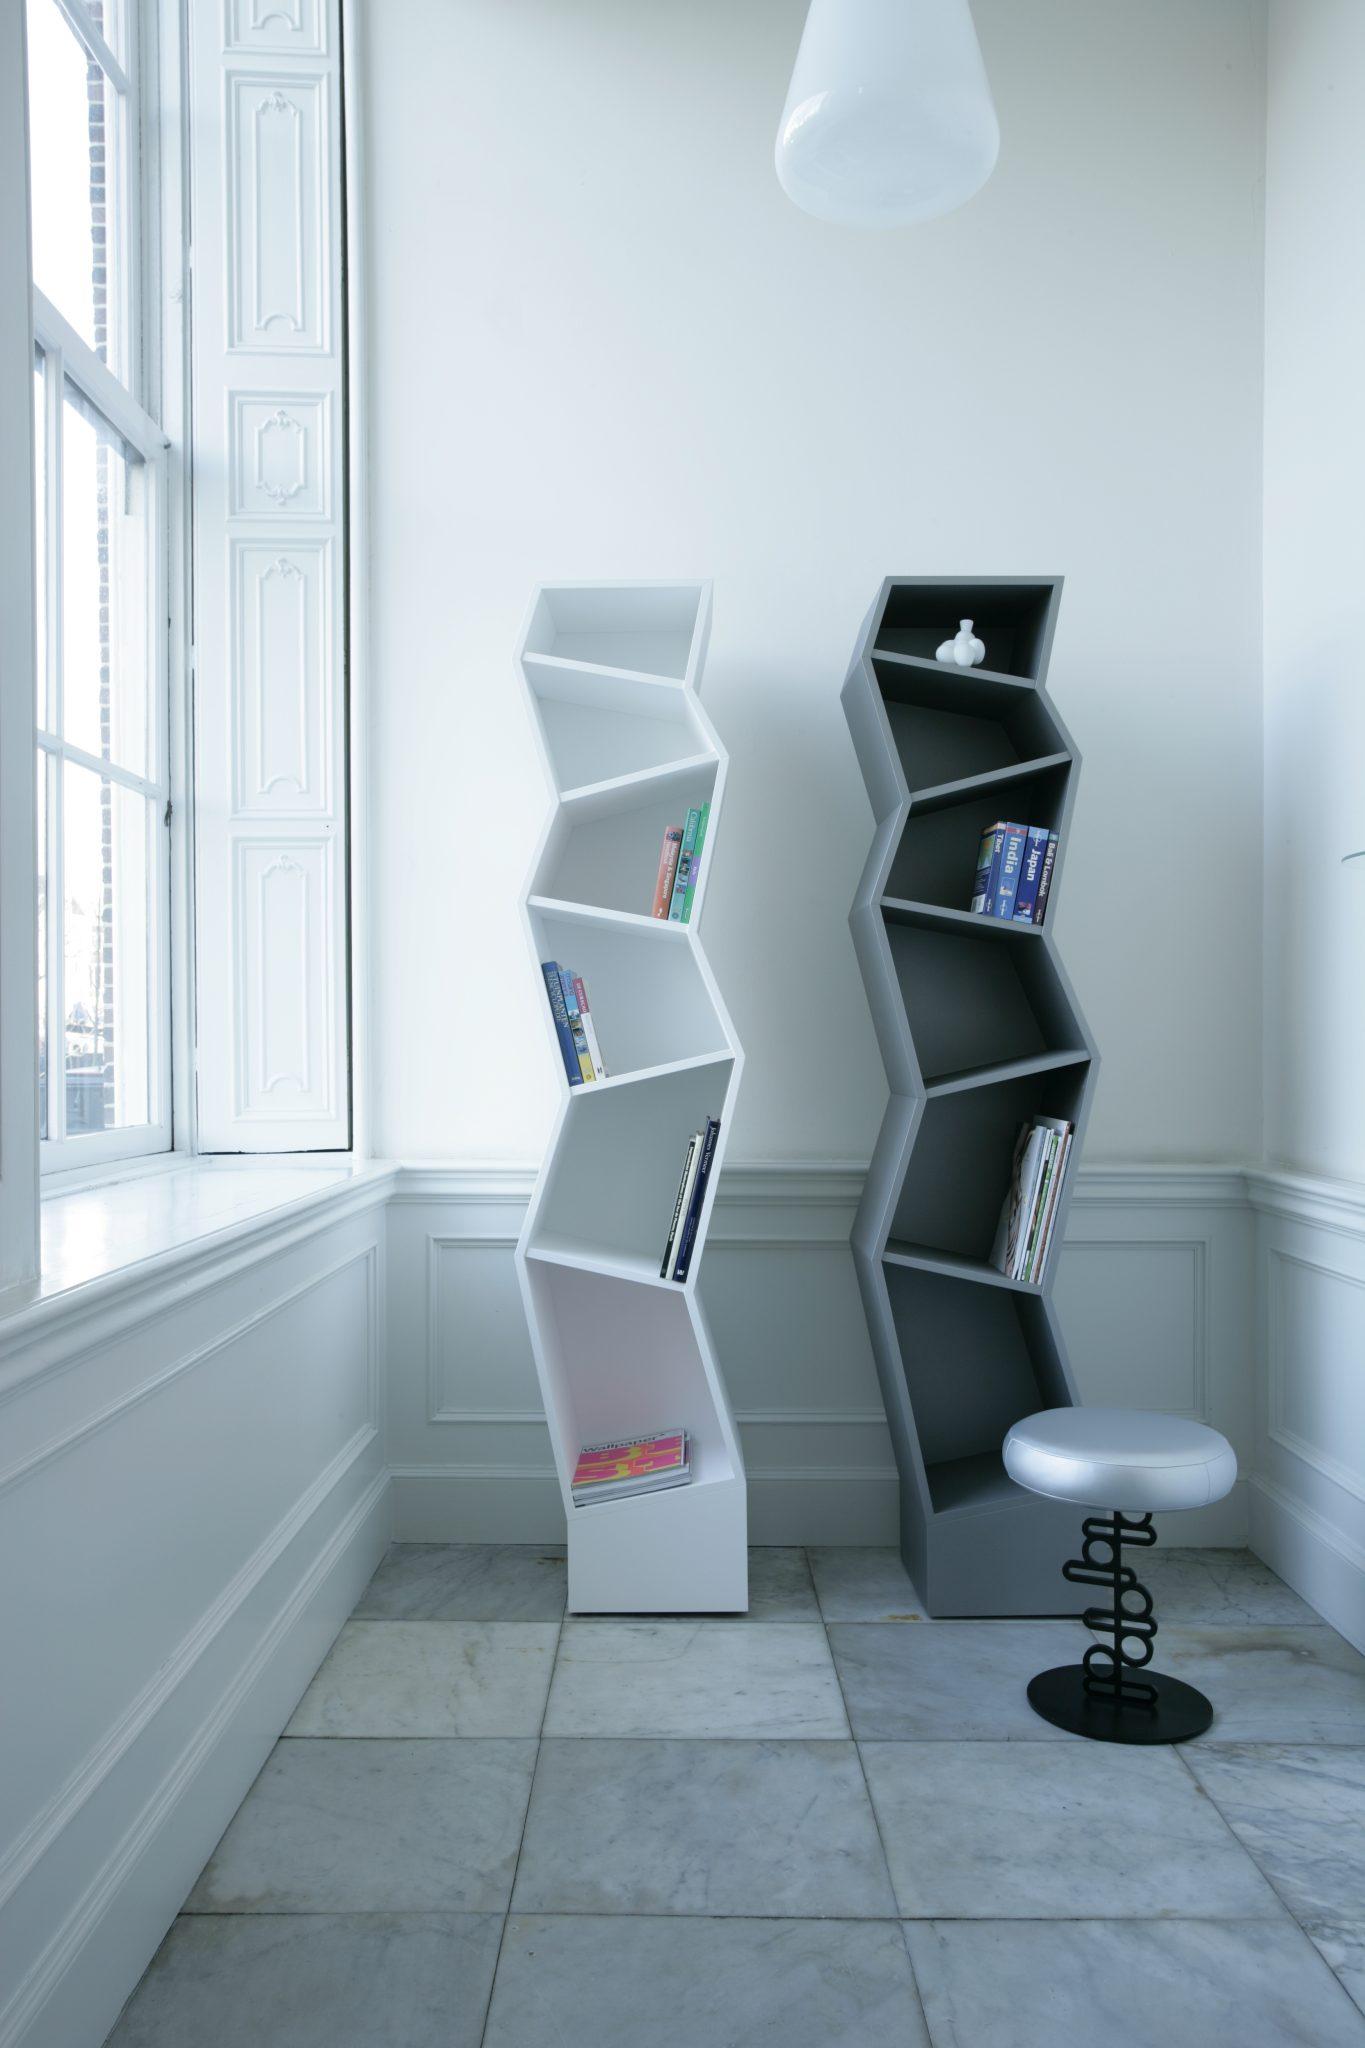 Empire Boekenkast Design Alfredo Haberli voor Quodes - Smukdesign